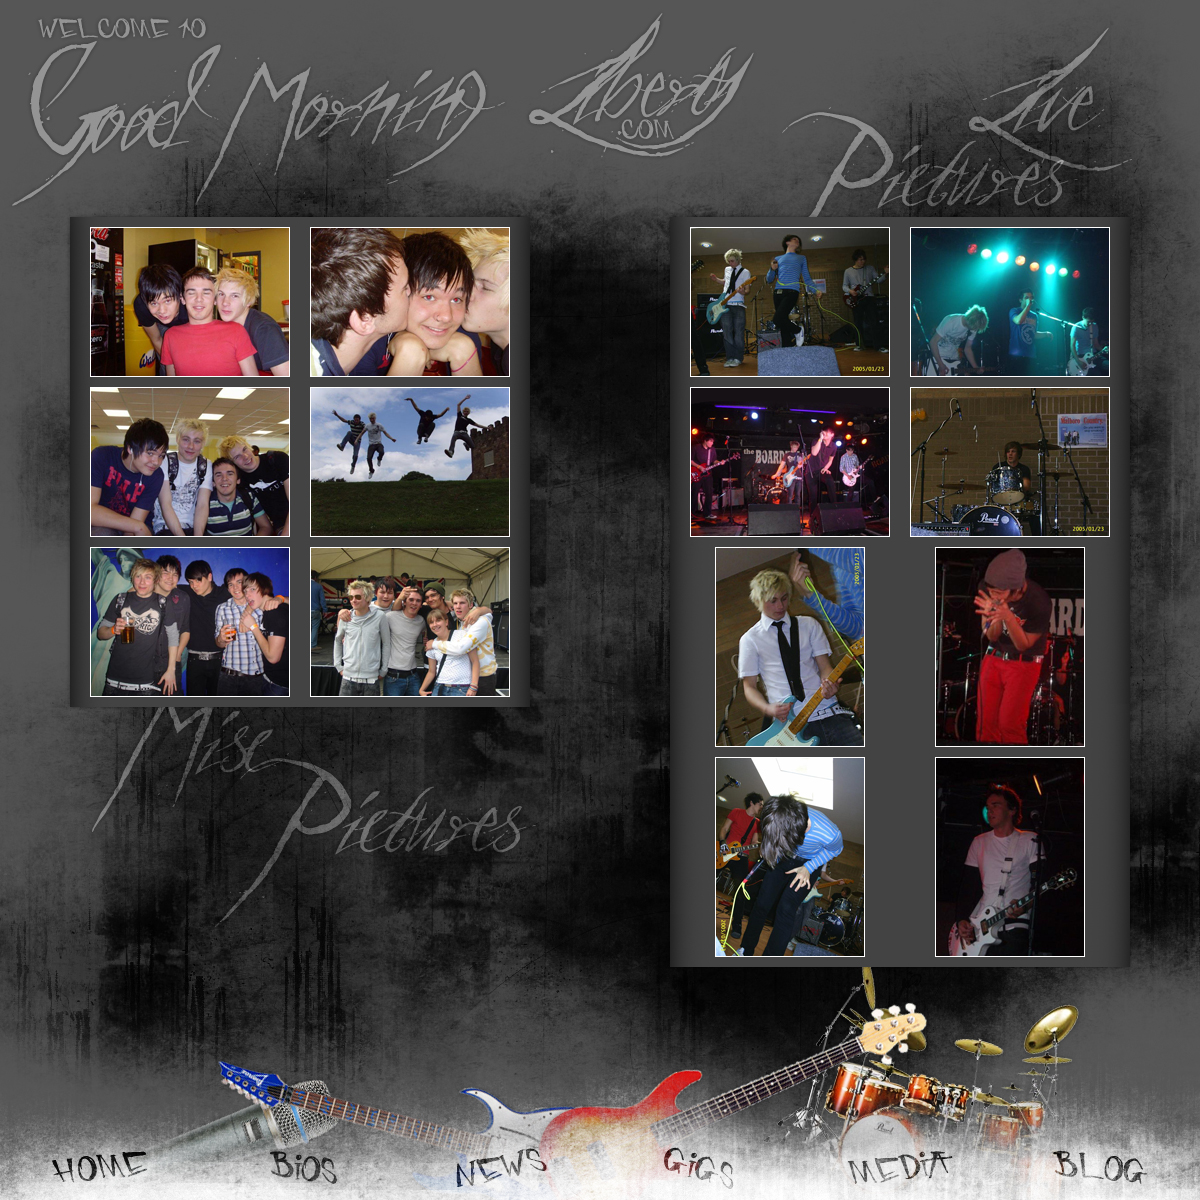 Good Morning Liberty.com 2 by DarkVortexX